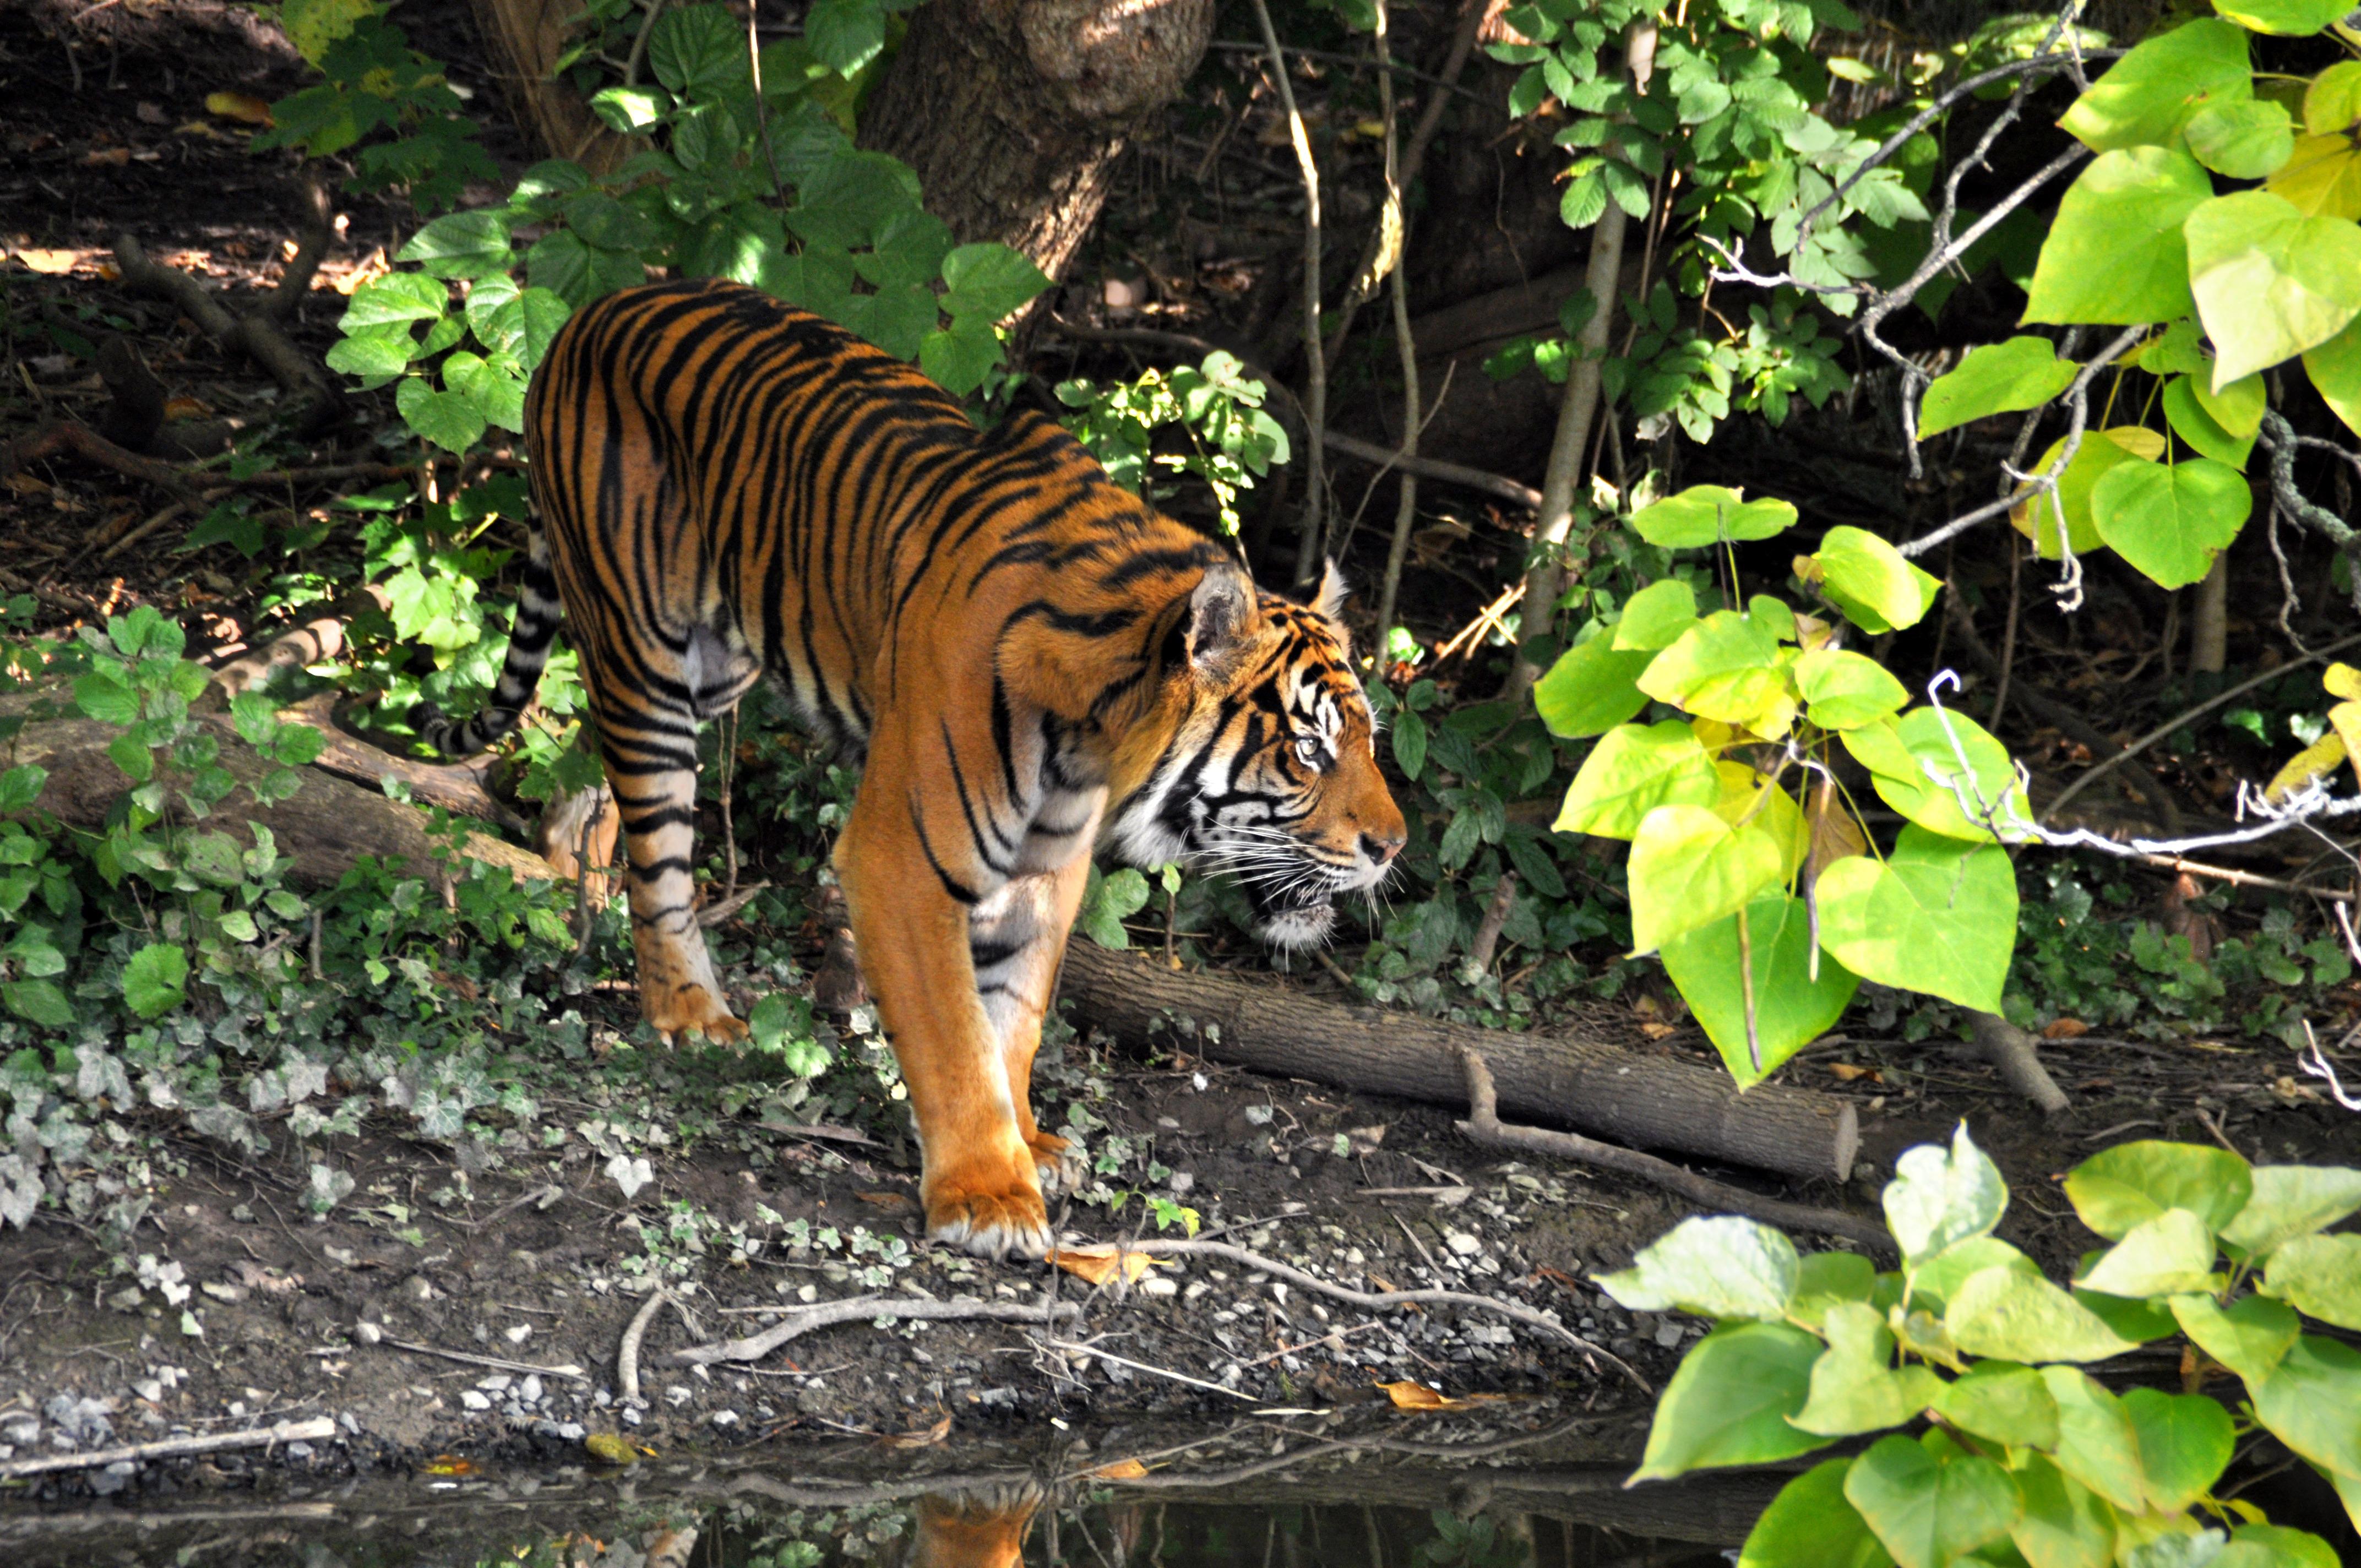 fotos gratis fauna silvestre zoo selva gato depredador tigre animales rayas peligroso. Black Bedroom Furniture Sets. Home Design Ideas